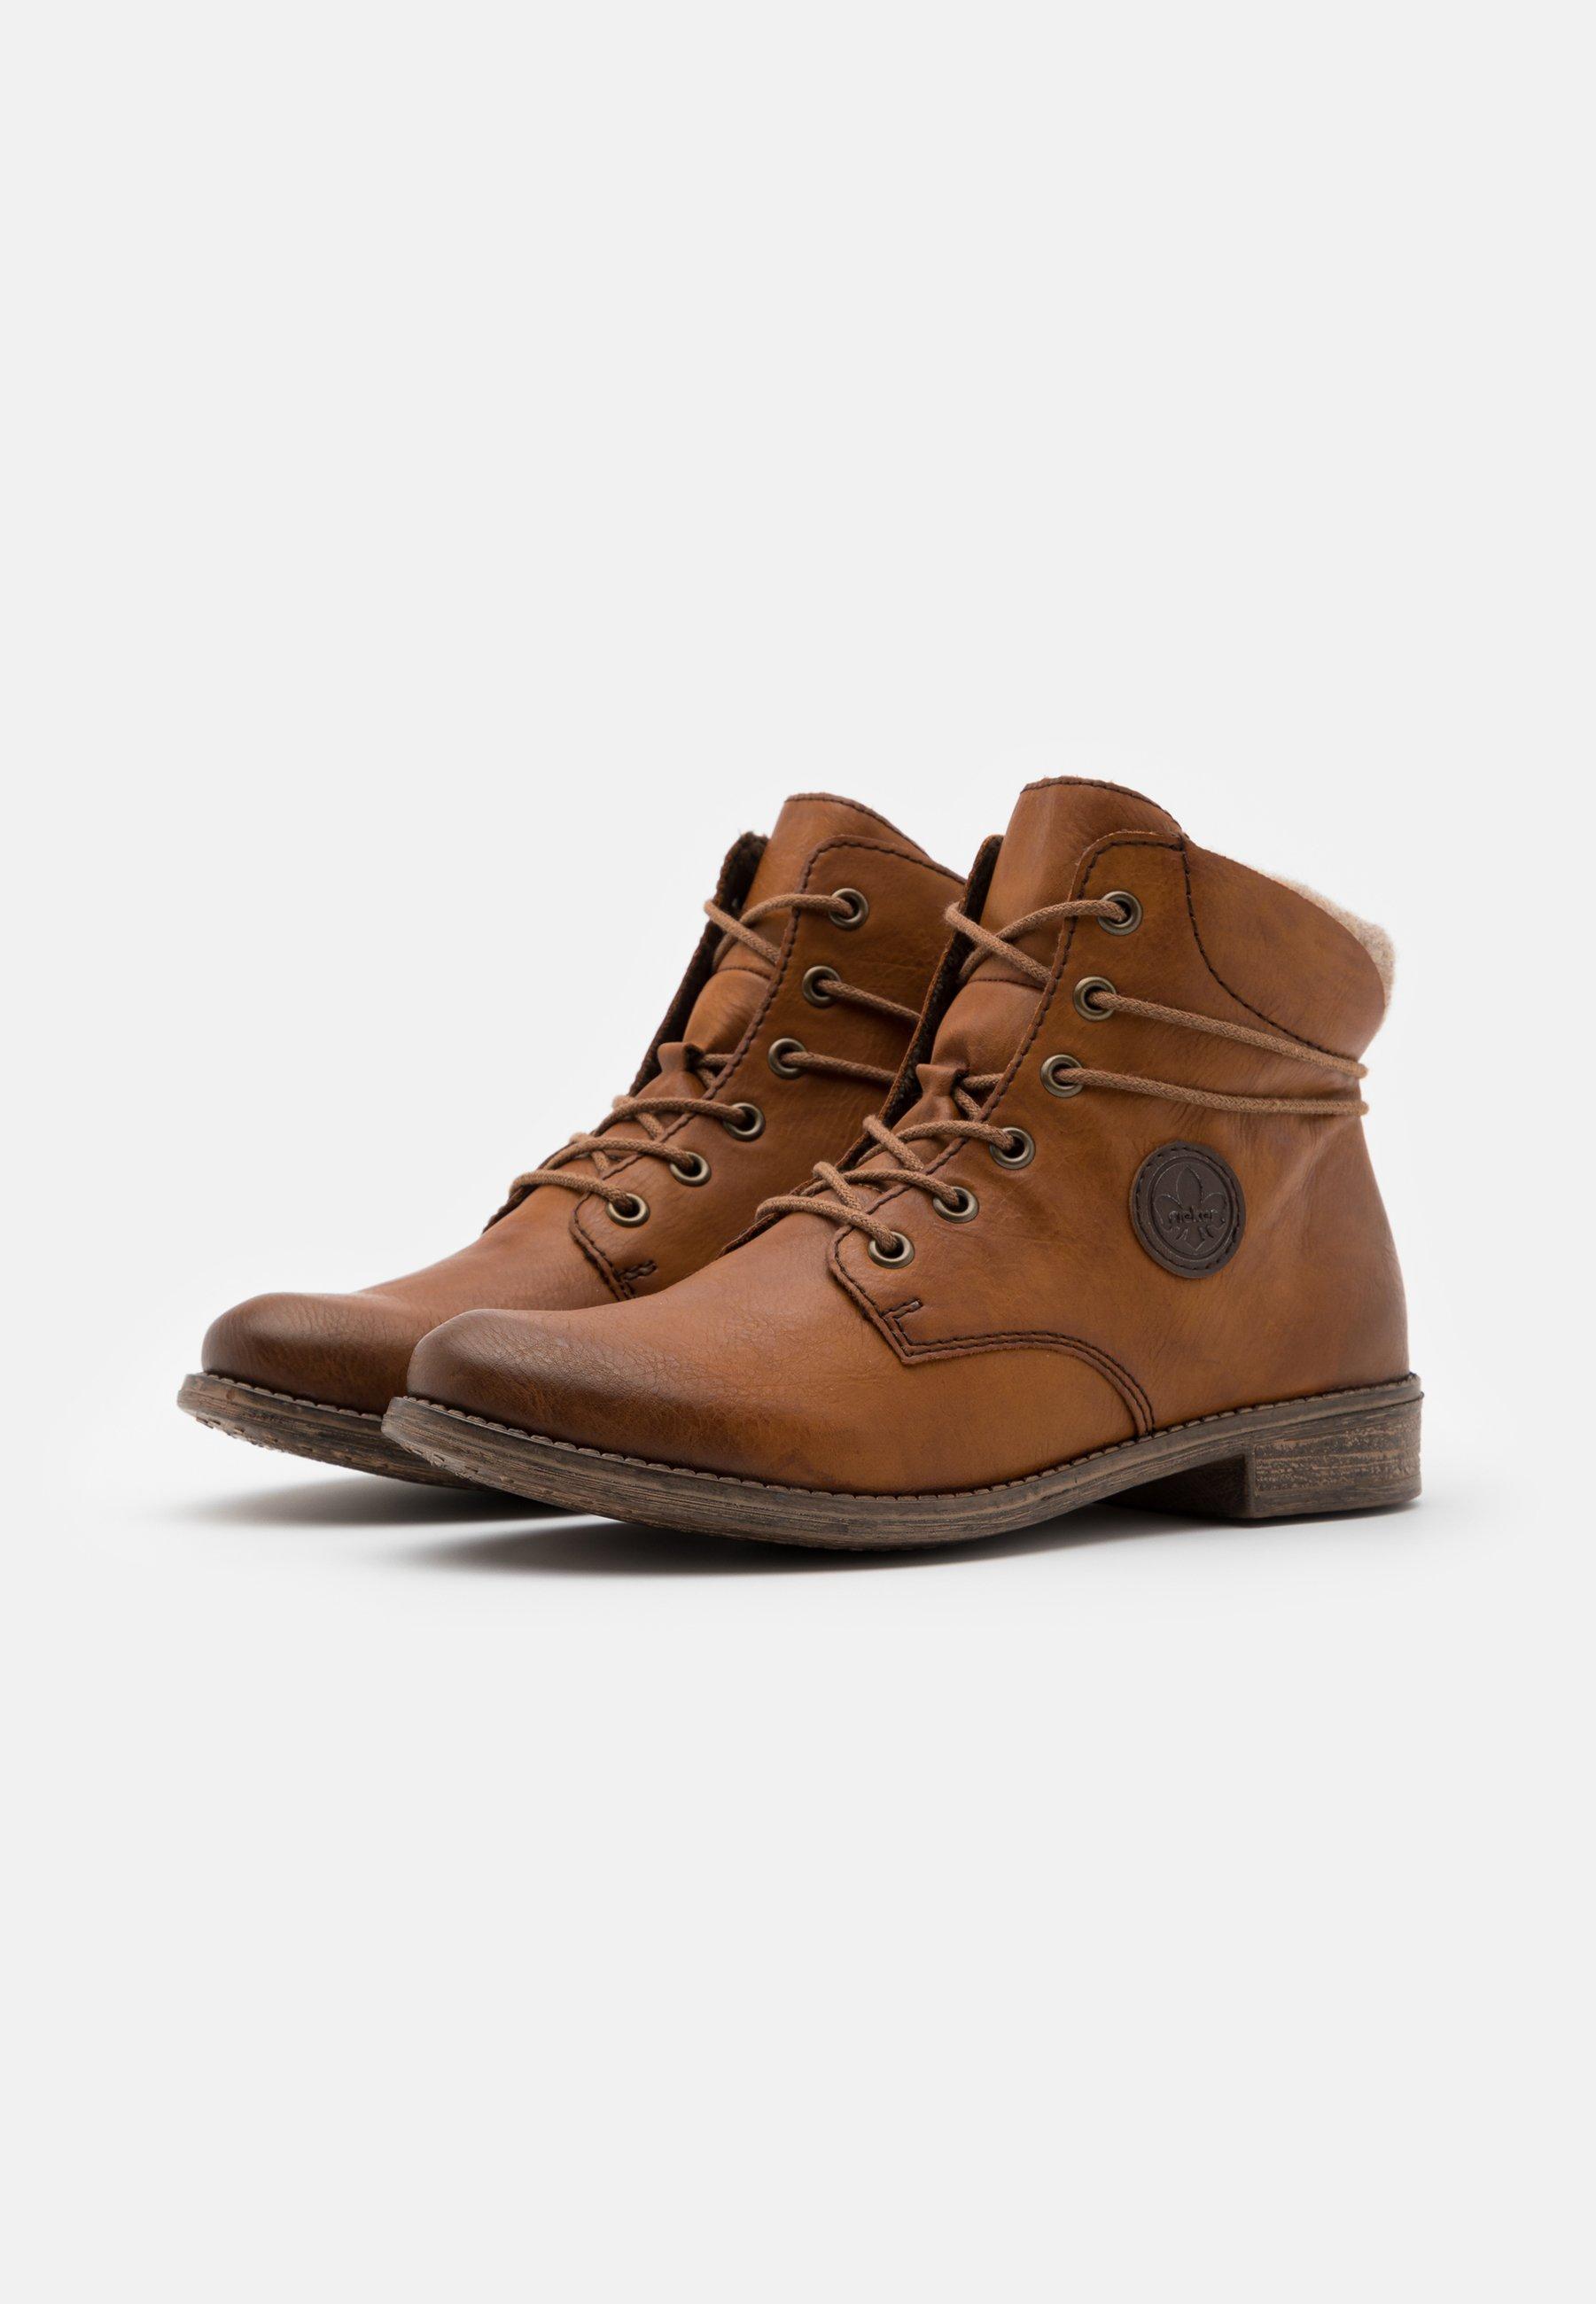 Rieker Ankle Boot cayenne/wood/kastanie/tan